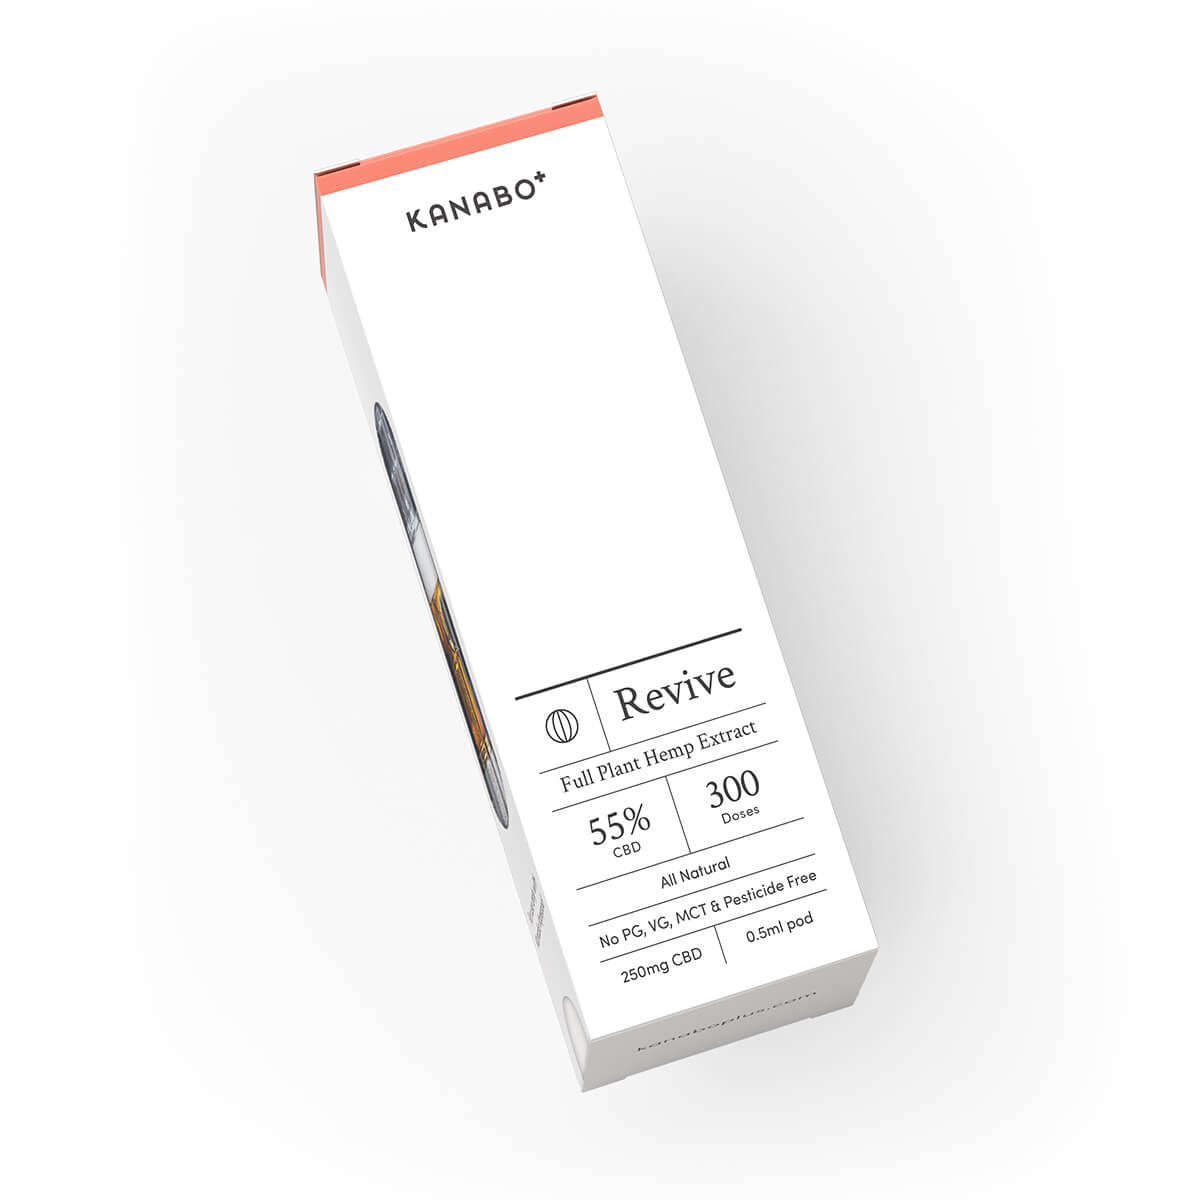 Kanabo Revive 55% CBD 0.5ml Pod Vapepod Competable CCELL Tecnology